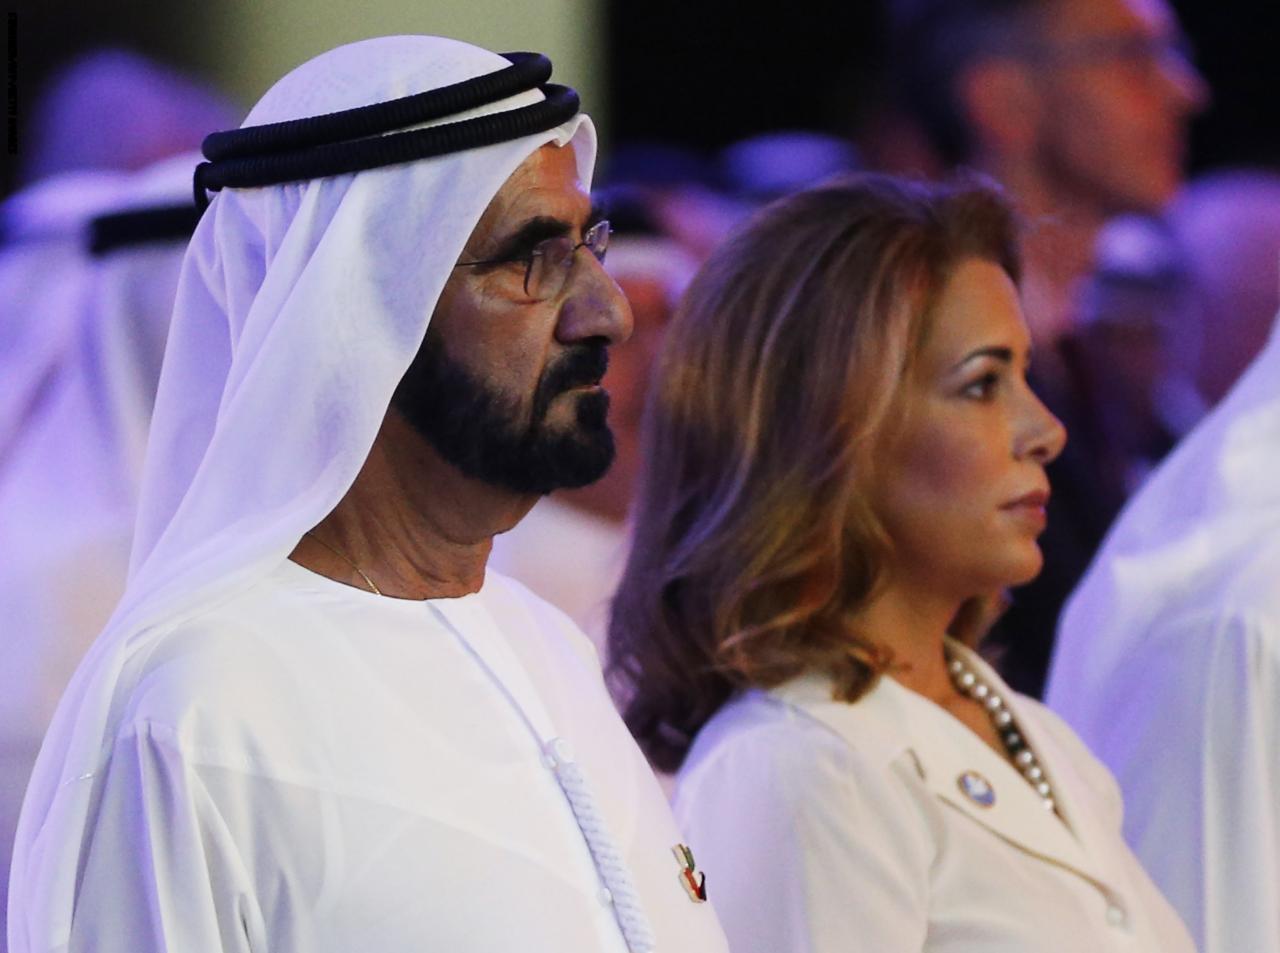 سي ان ان : حاكم دبي يقاضي زوجته هيا بالمحكمة العليا ببريطانيا